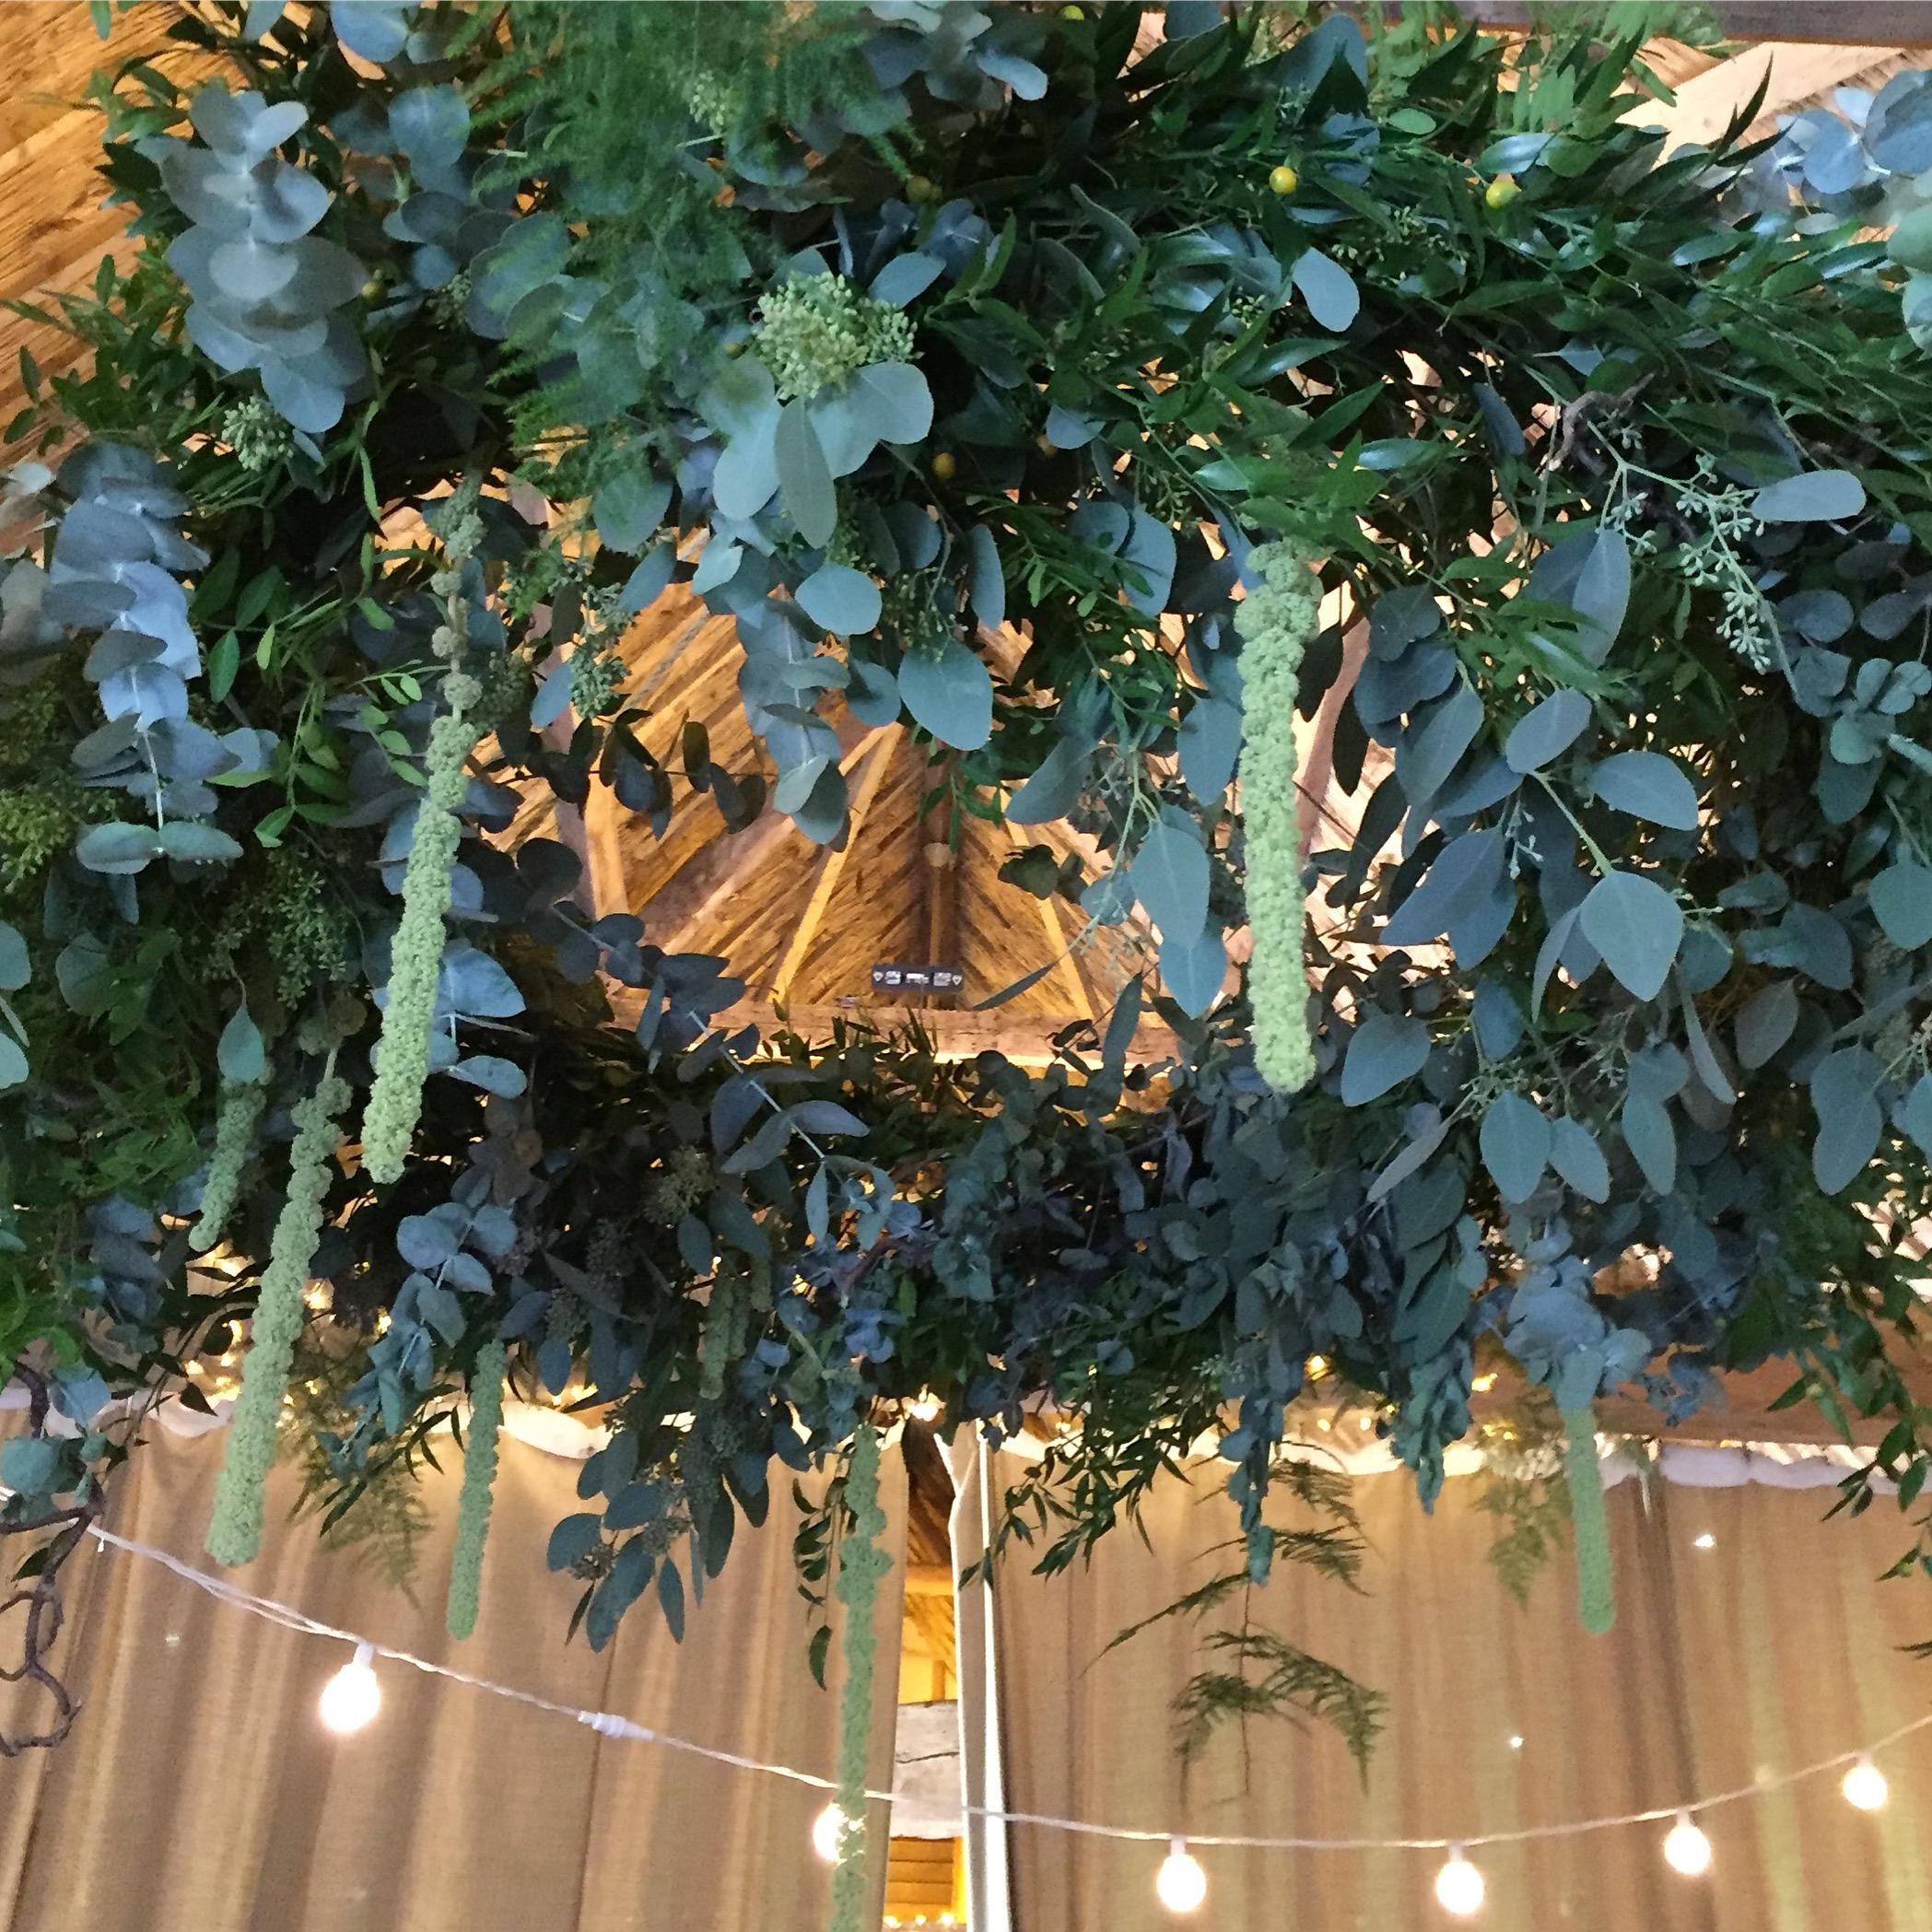 Hanging chandelier full of eucalyptus, ferns and amaranthus